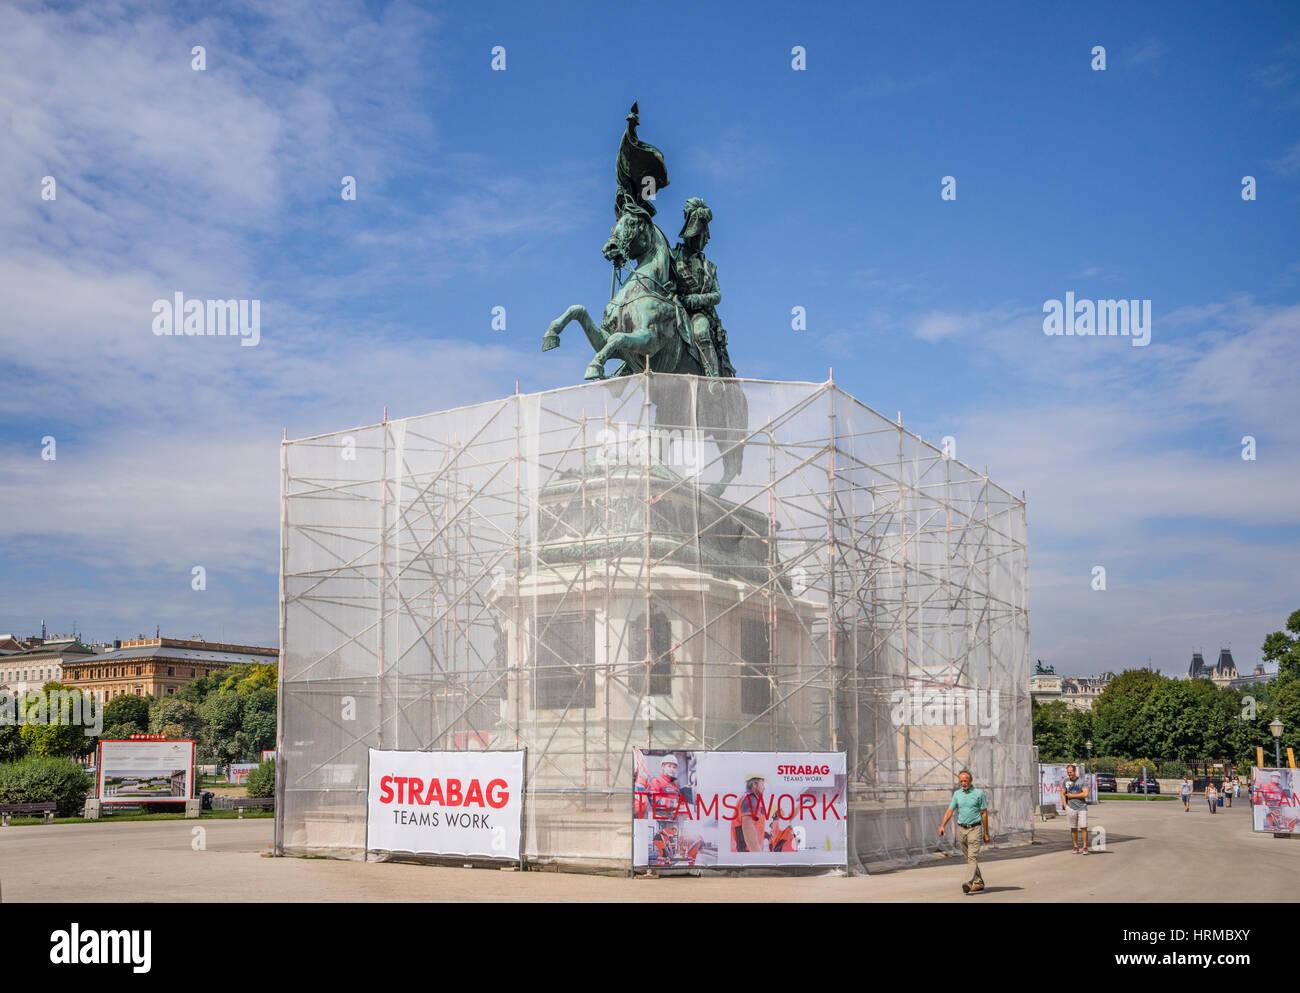 Austria, Vienna, Heldenplatz, the equestrian statue of Archduke Charles of Austria under renovation - Stock Image